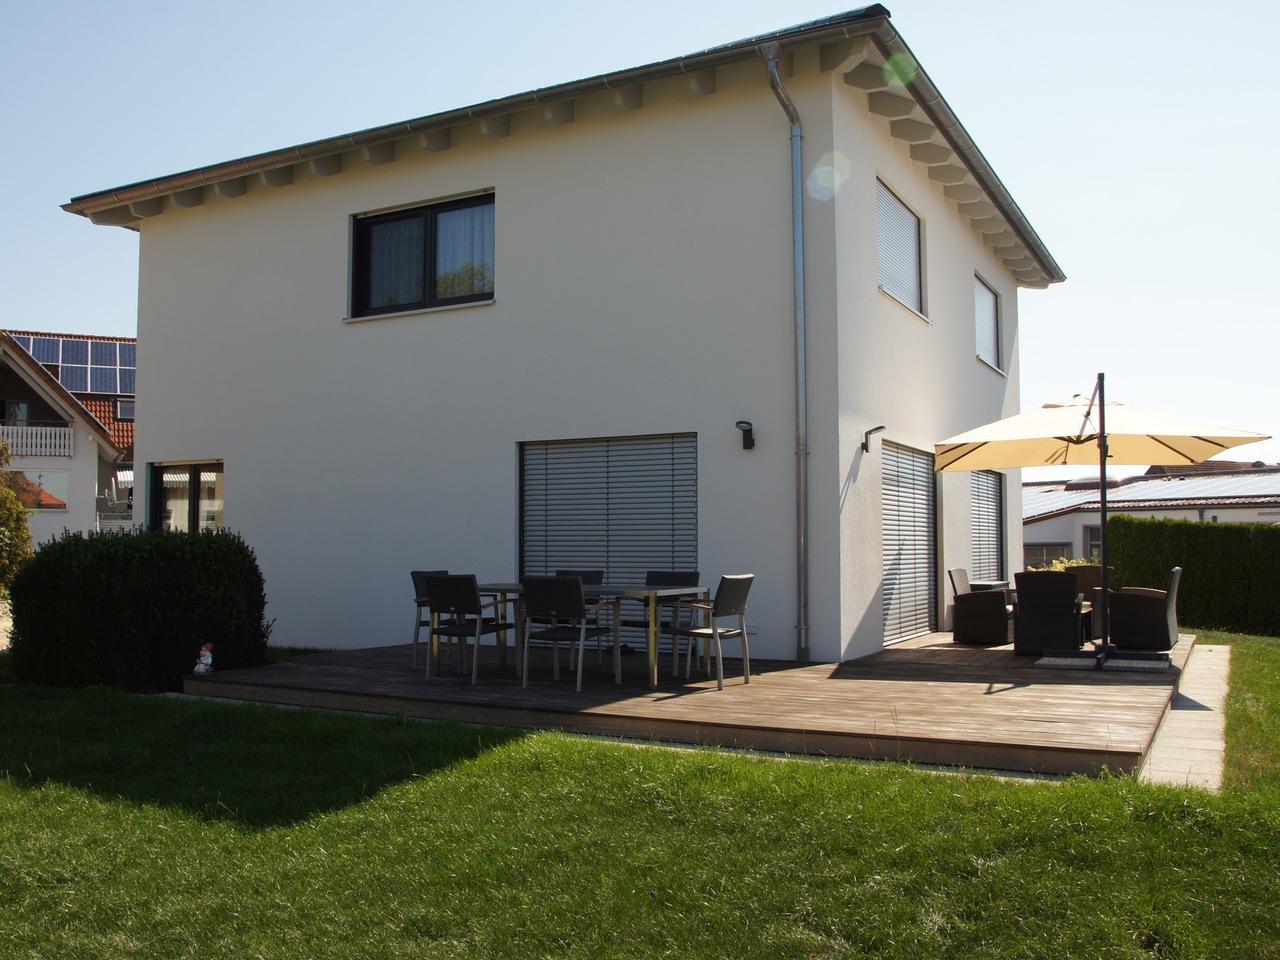 Stadtvilla 149 Ansicht 2 - Holzbau Kielwein